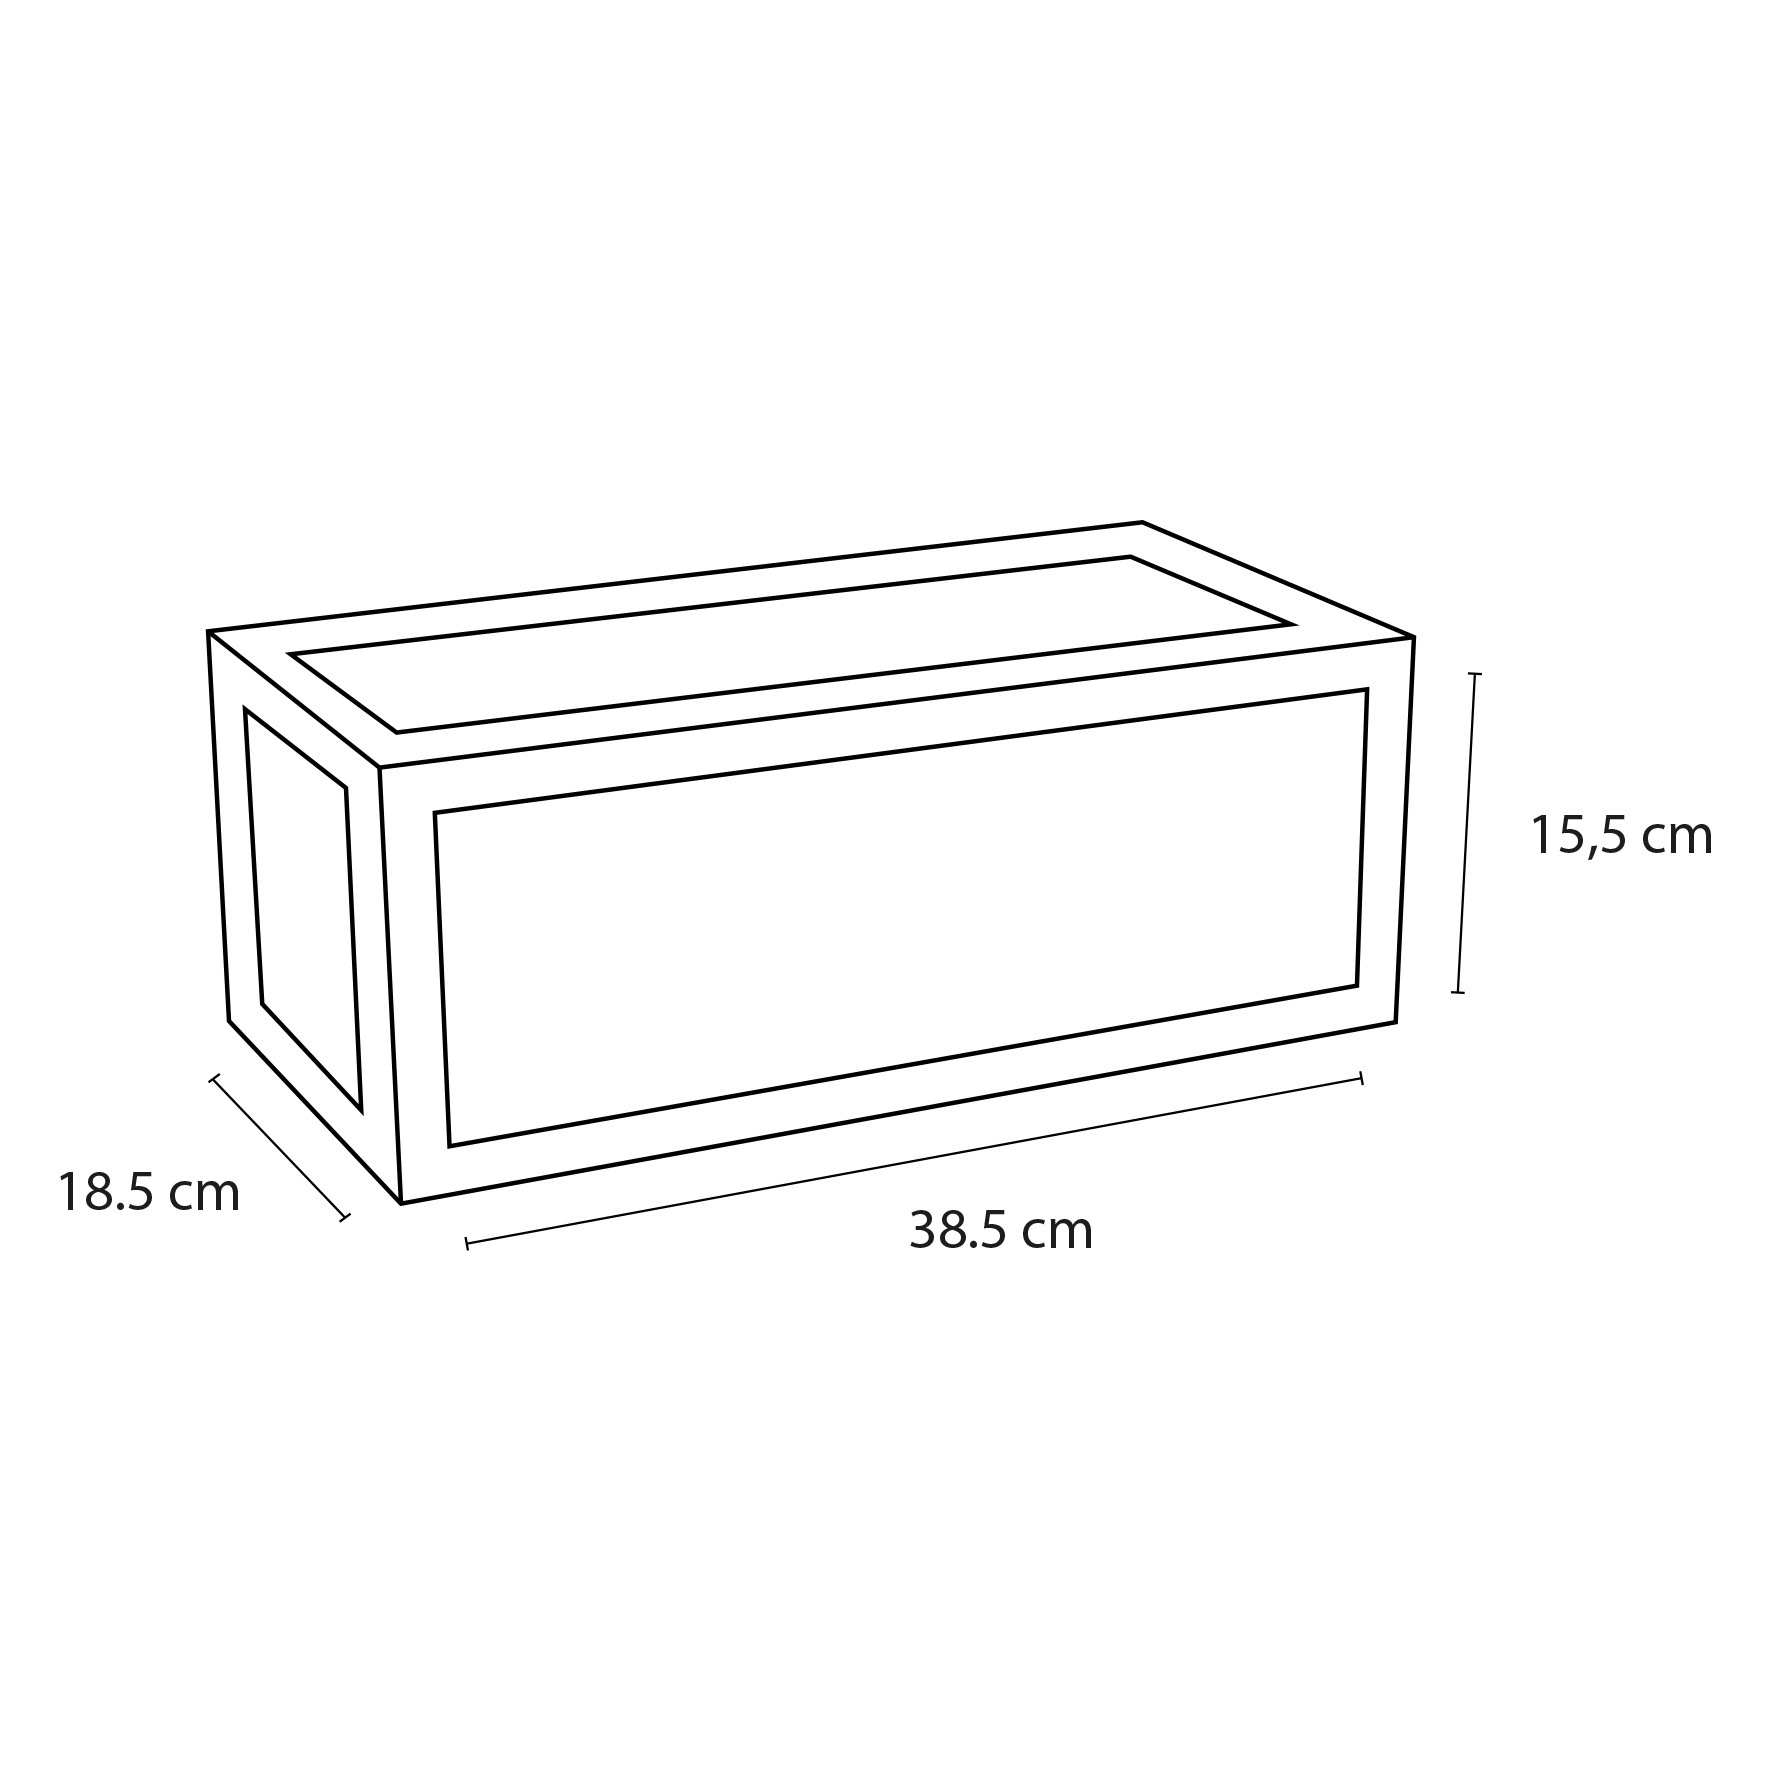 Handdoekrek fontein 38.5 x 18.5 cm Zwart-4